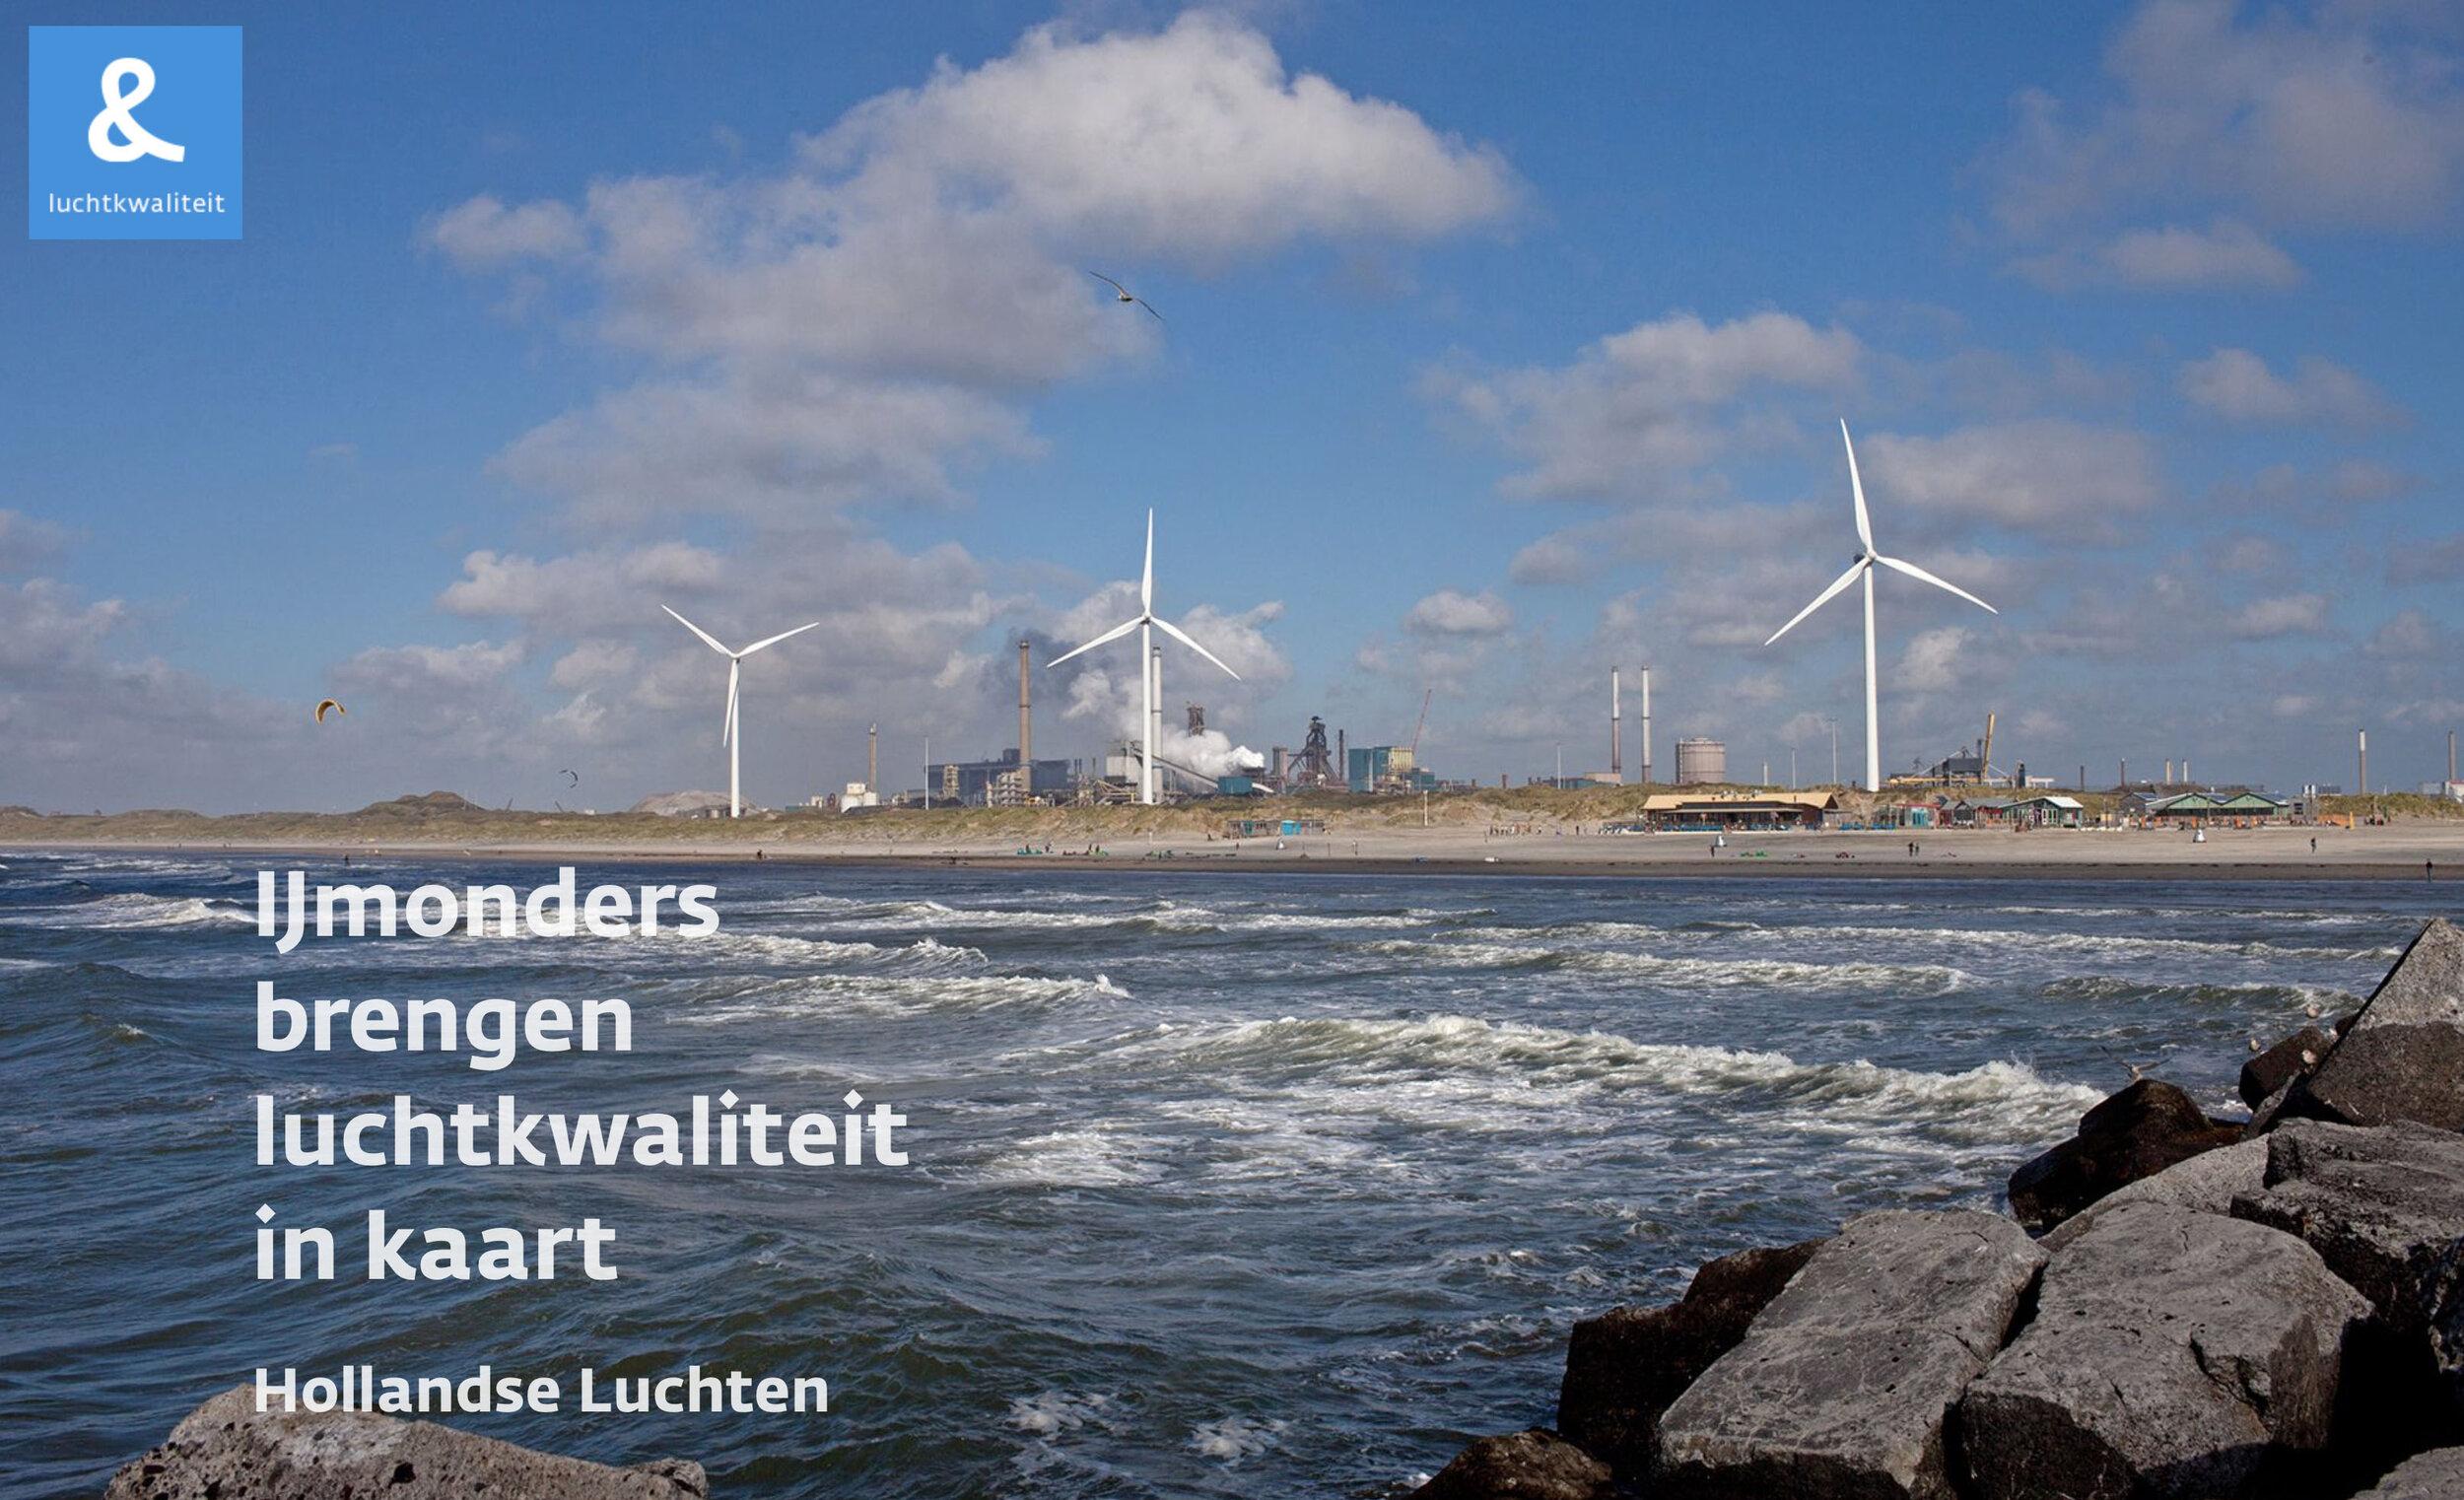 Provincie Noord-Hollands_Hollandse Luchten_1.jpg